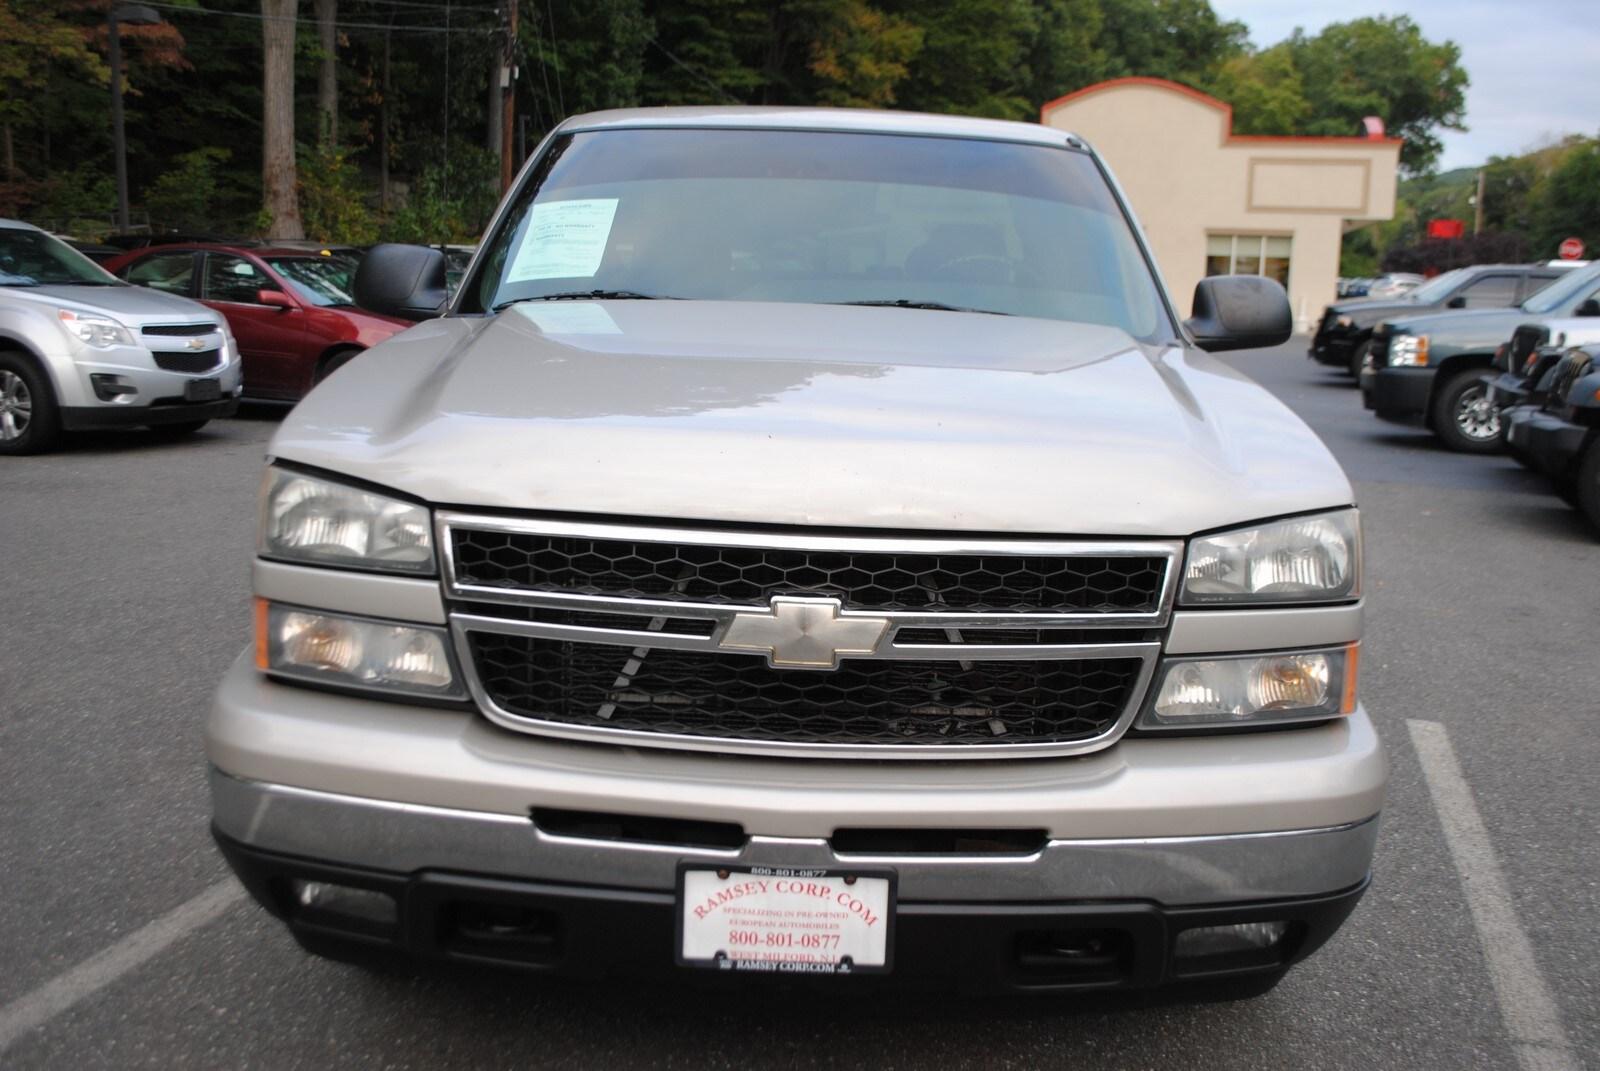 Used 2006 Chevrolet Silverado 1500 For Sale at Ramsey Corp    VIN